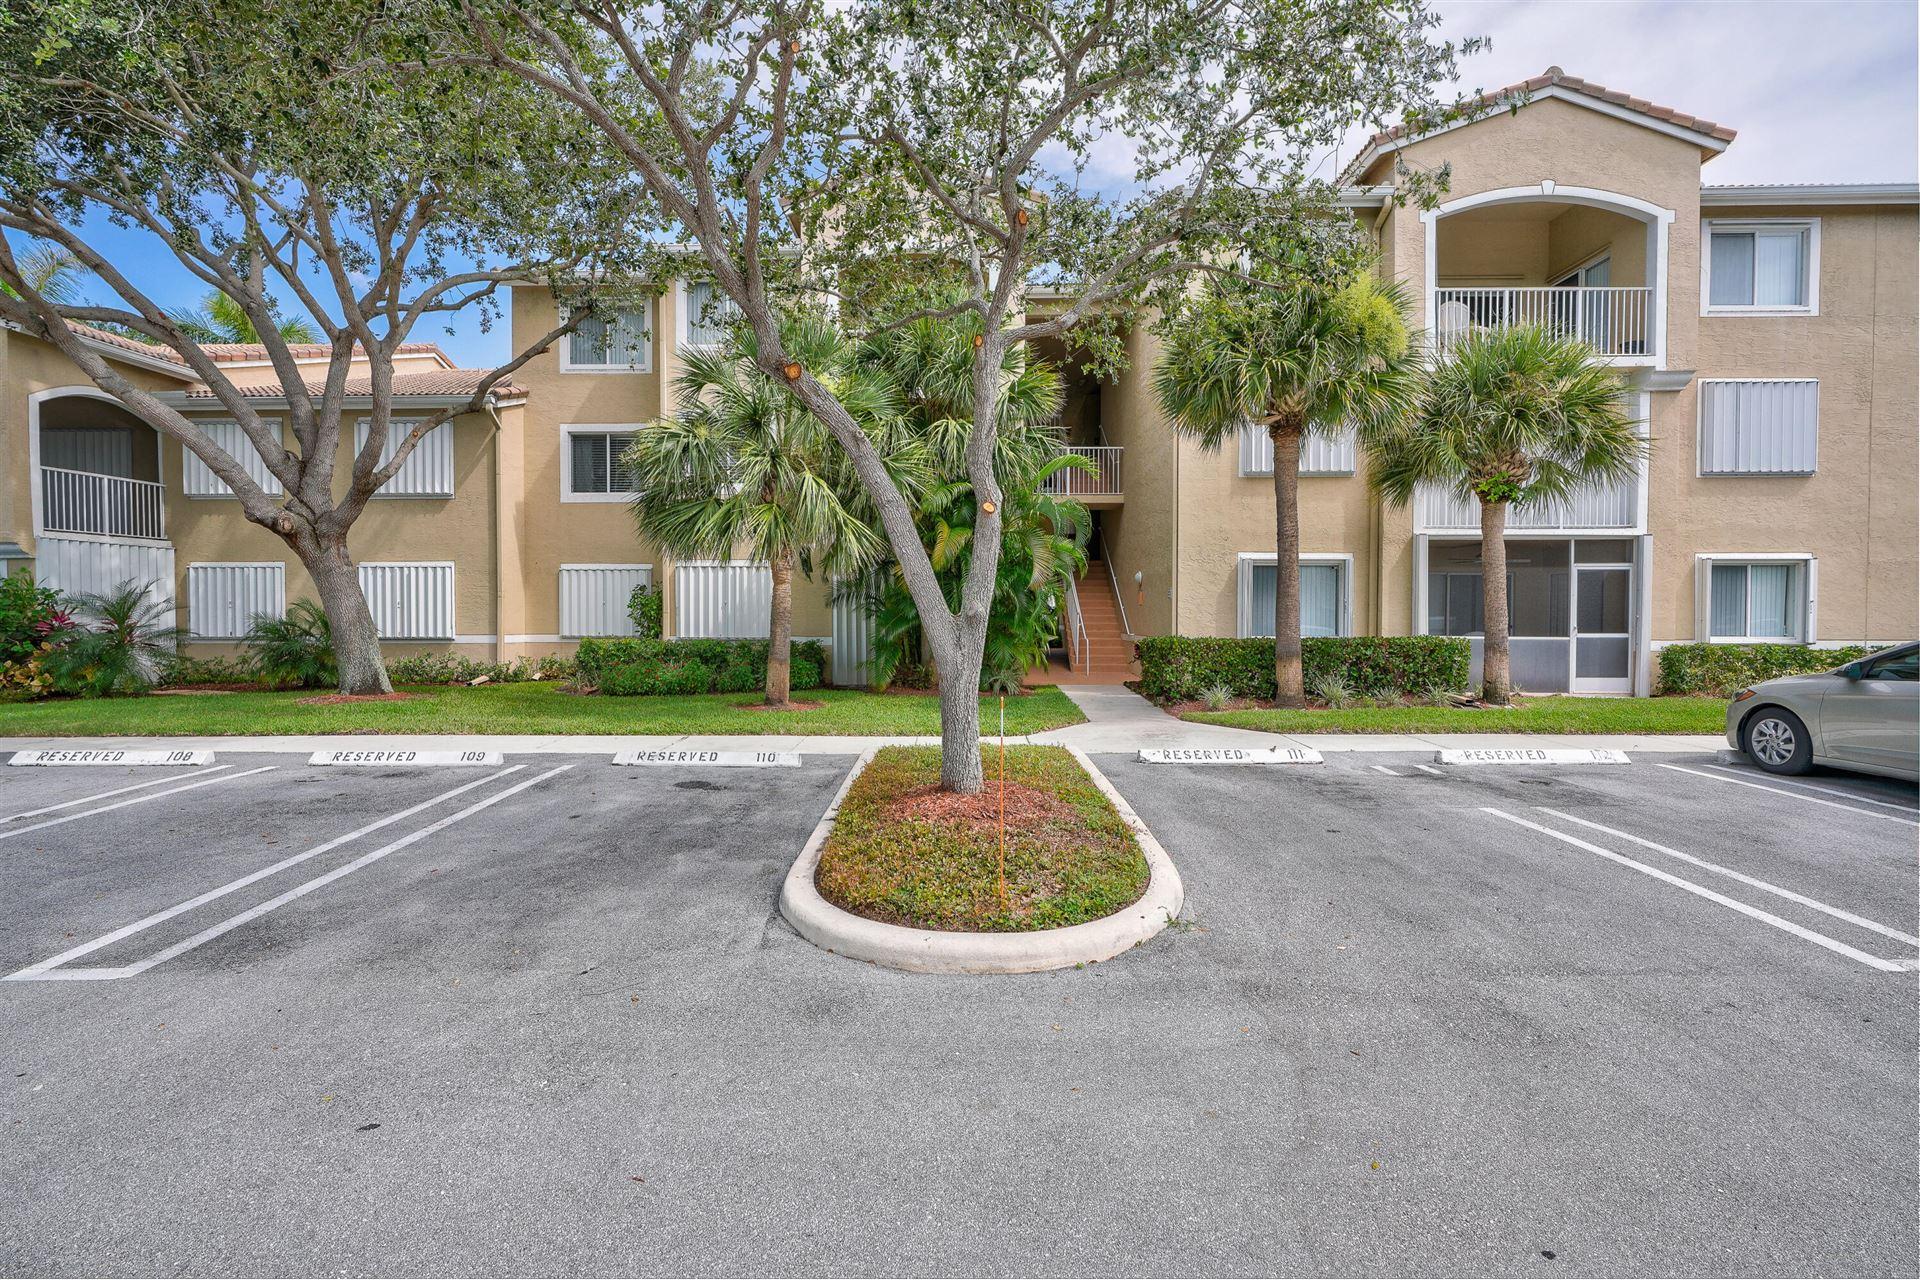 Photo of 236 Village Boulevard #1204, Tequesta, FL 33469 (MLS # RX-10742937)